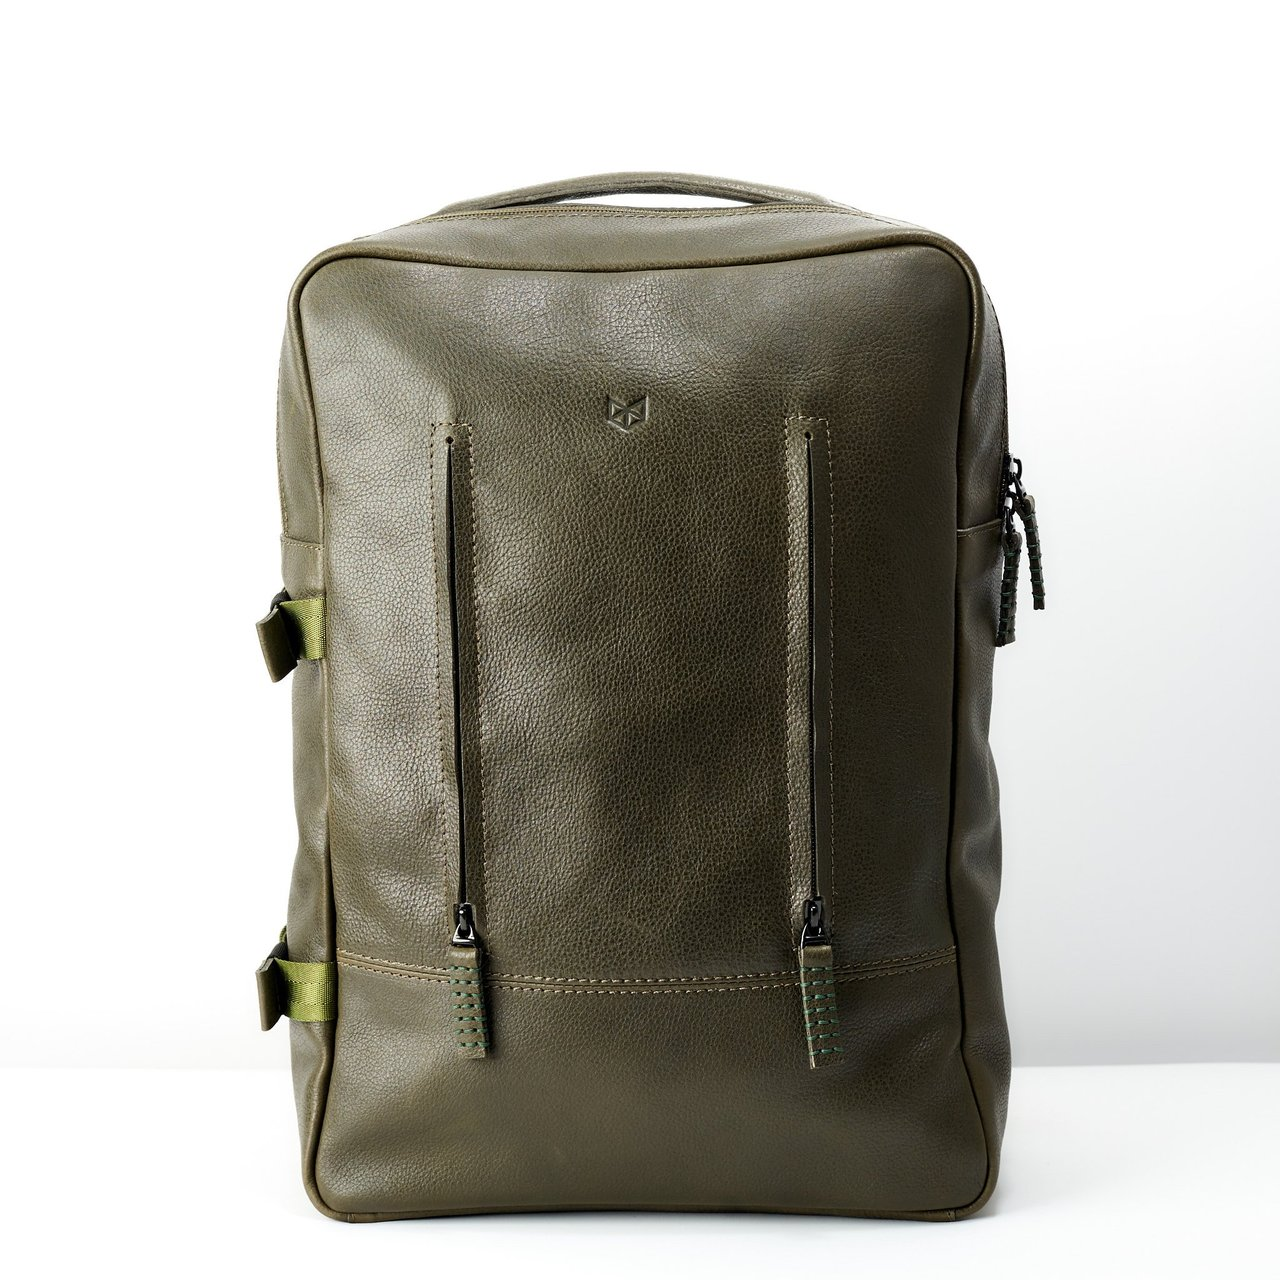 Hunter Green Leather Tamarao Backpack Rucksack